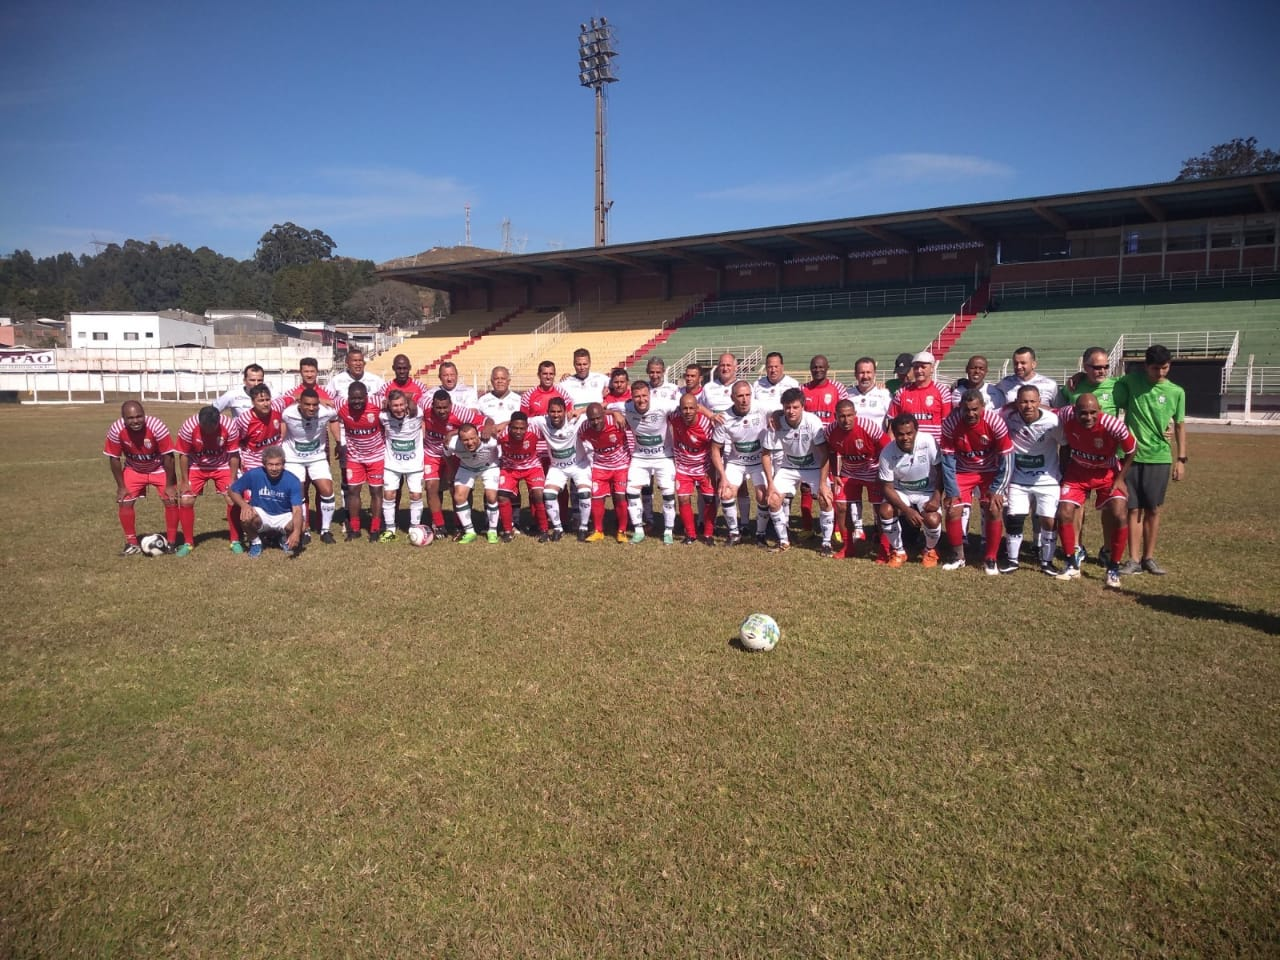 Master da Caldense vence Oriente; Equipe fará amistoso contra o Santos em setembro